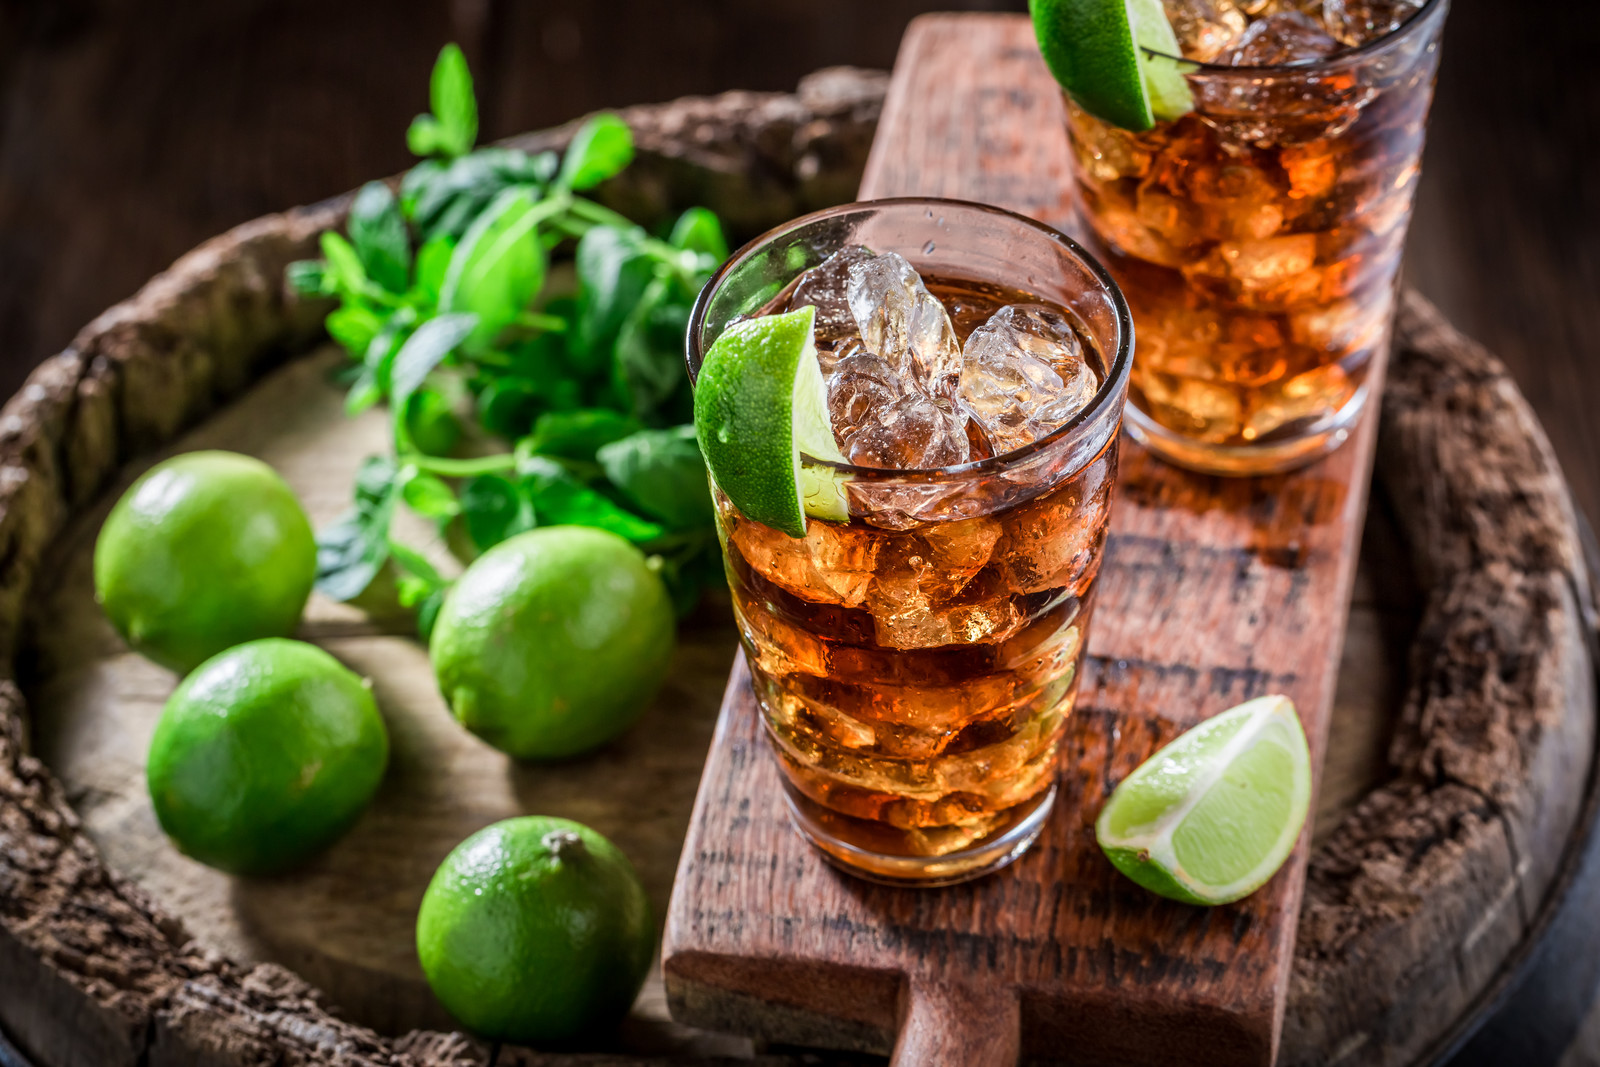 Tasty iced tea  with lime and ice